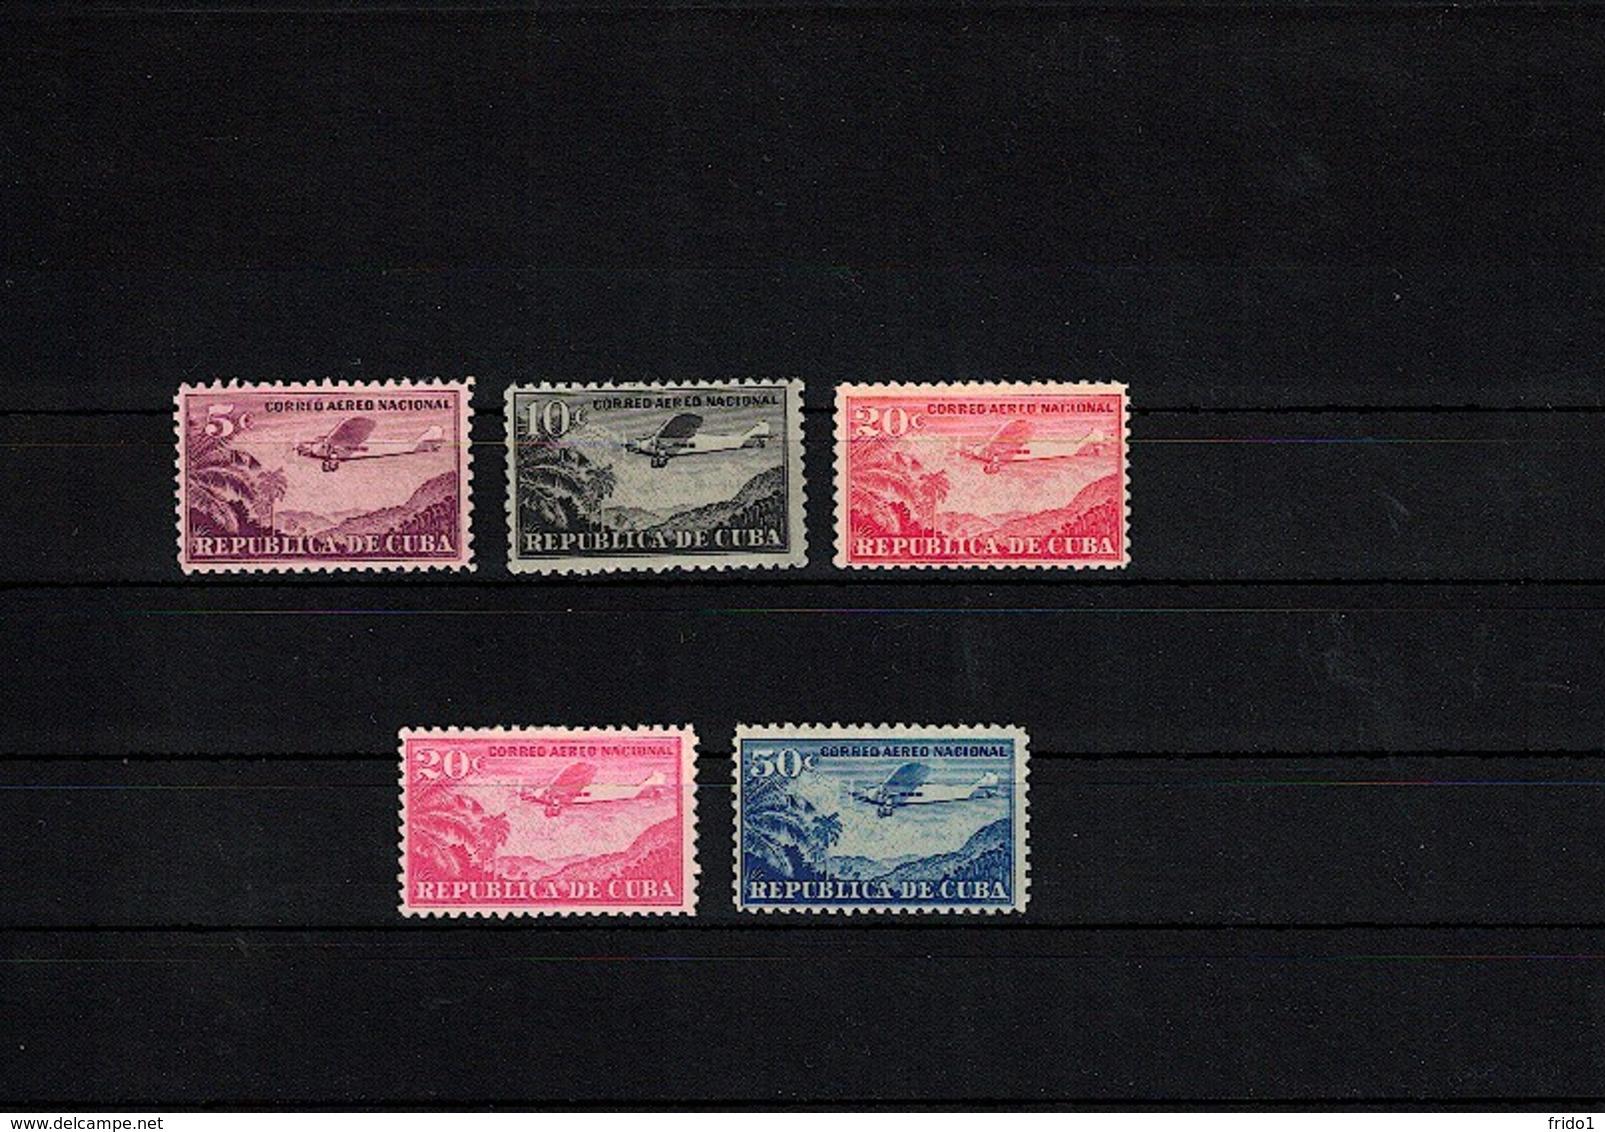 Cuba 1931 Airmail Stamps MH / Postfrisch Mit Falz - Kuba